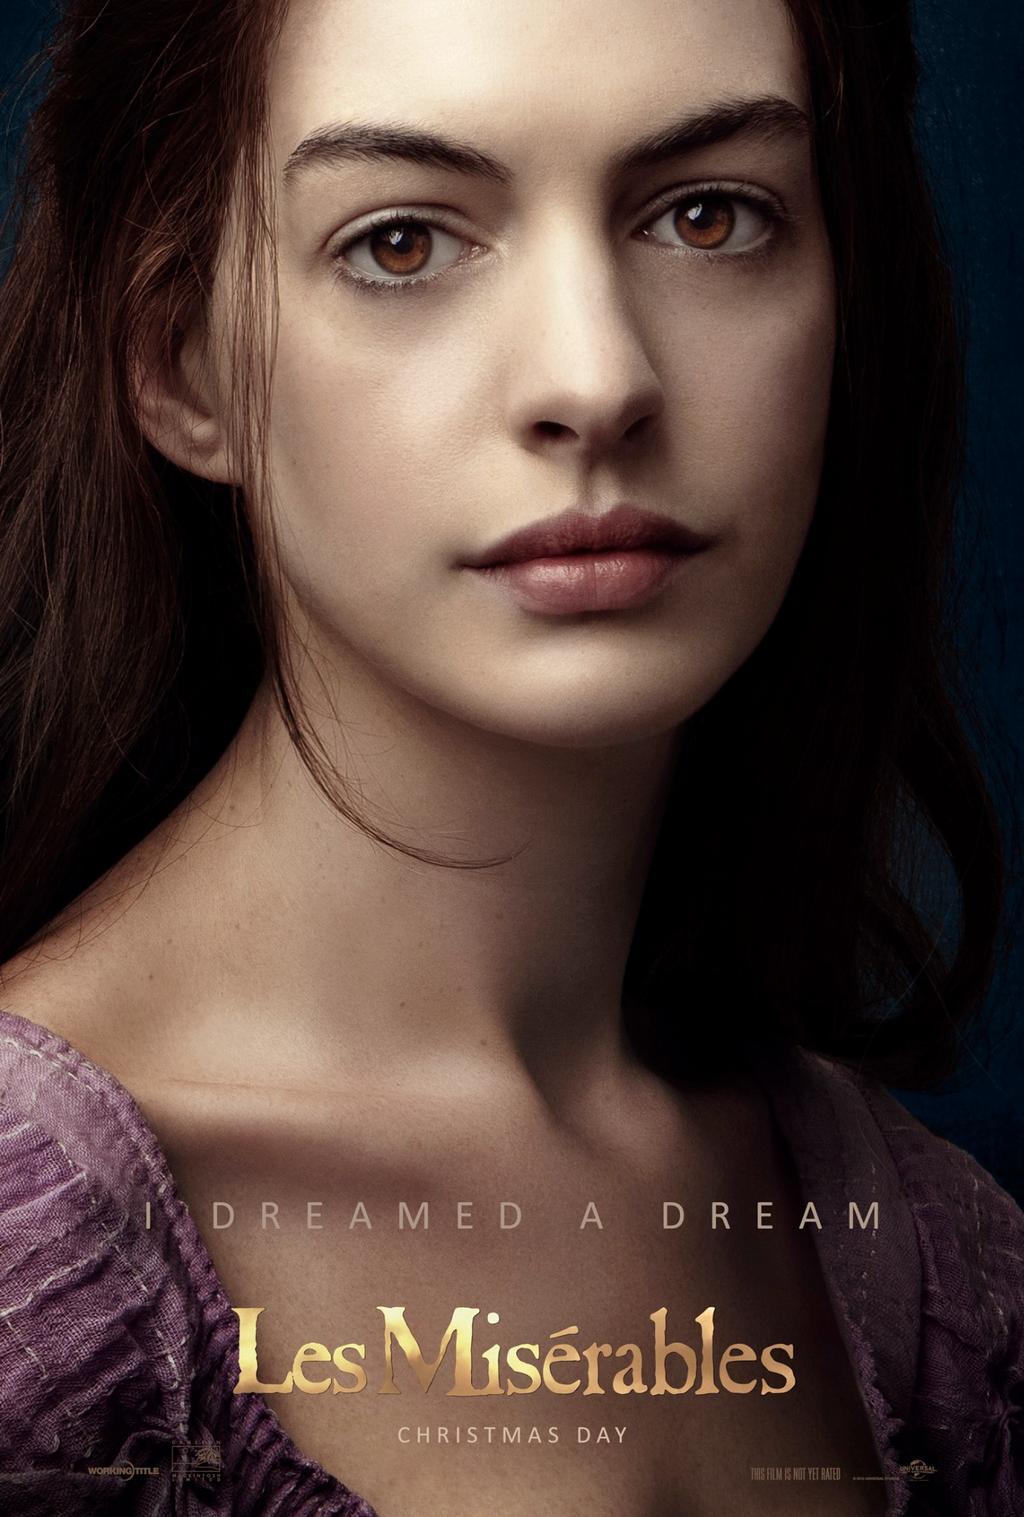 http://1.bp.blogspot.com/-y-n8H6I03e8/UHjv-cnTD1I/AAAAAAAACAI/eqtJUMASHfI/s1600/Les_Miserables_Hathaway.jpg